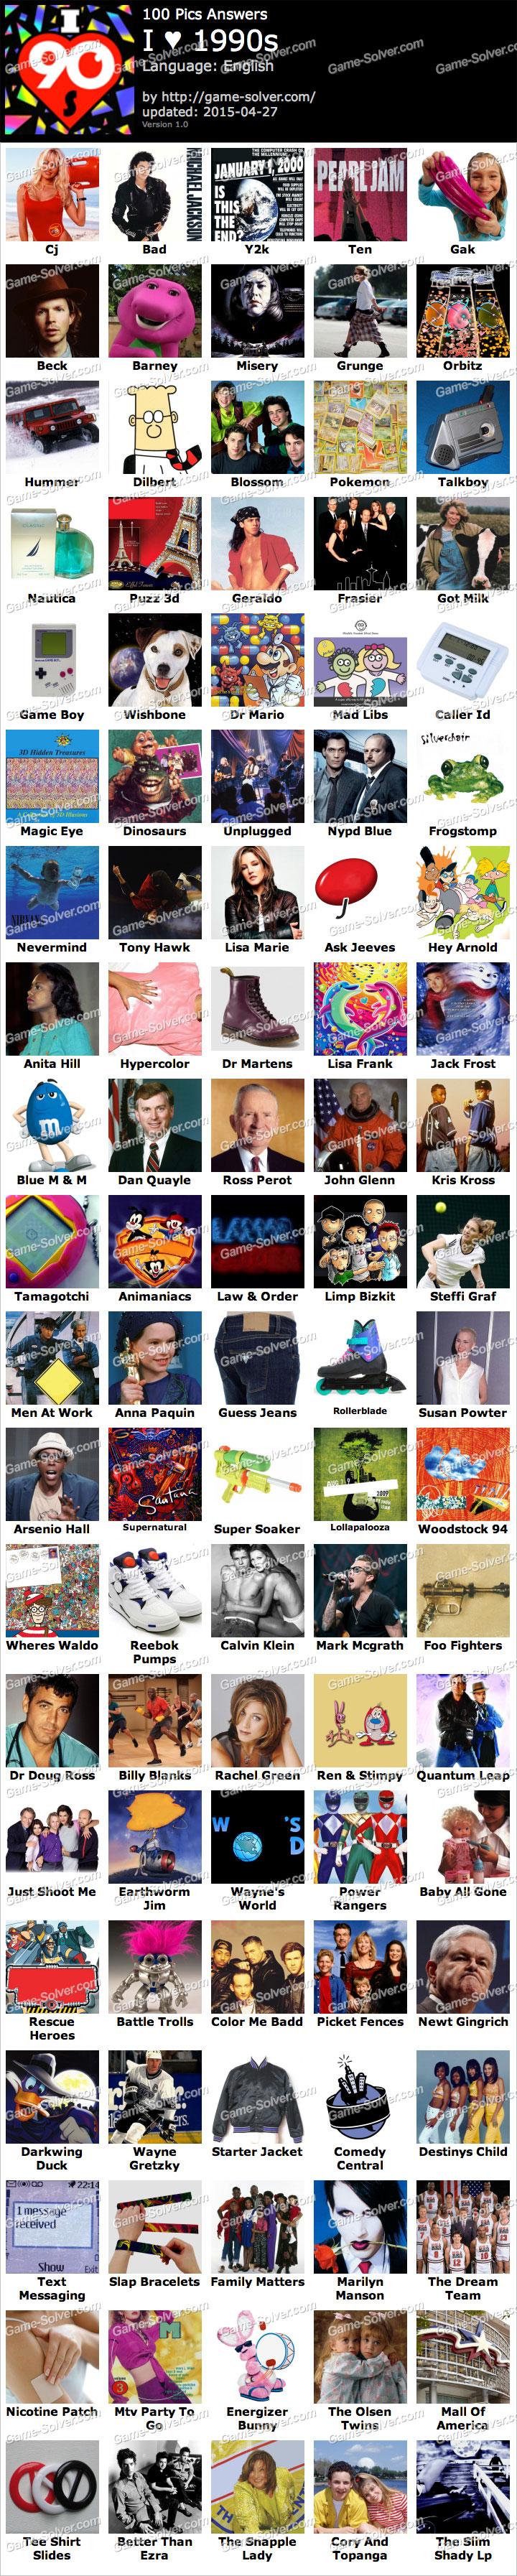 100 Pics Answers i Love 90s 100 Pics i Love 1990s